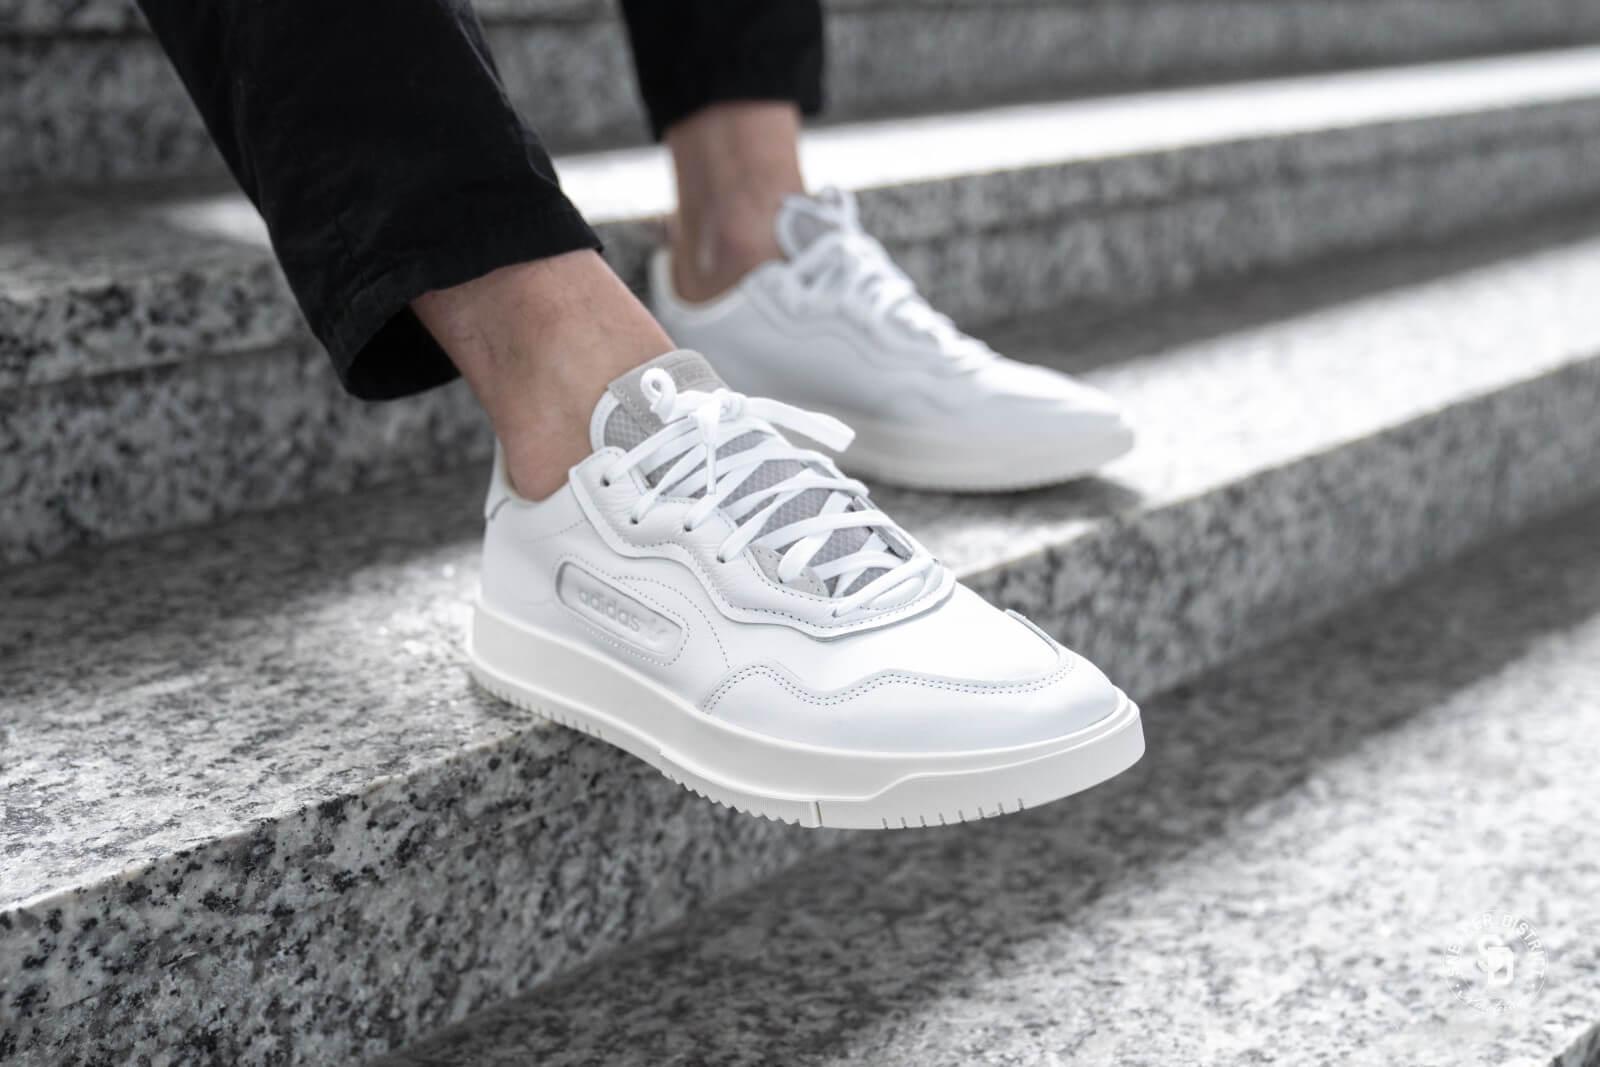 Adidas SC Premiere Footwear WhiteCrystal White BD7583